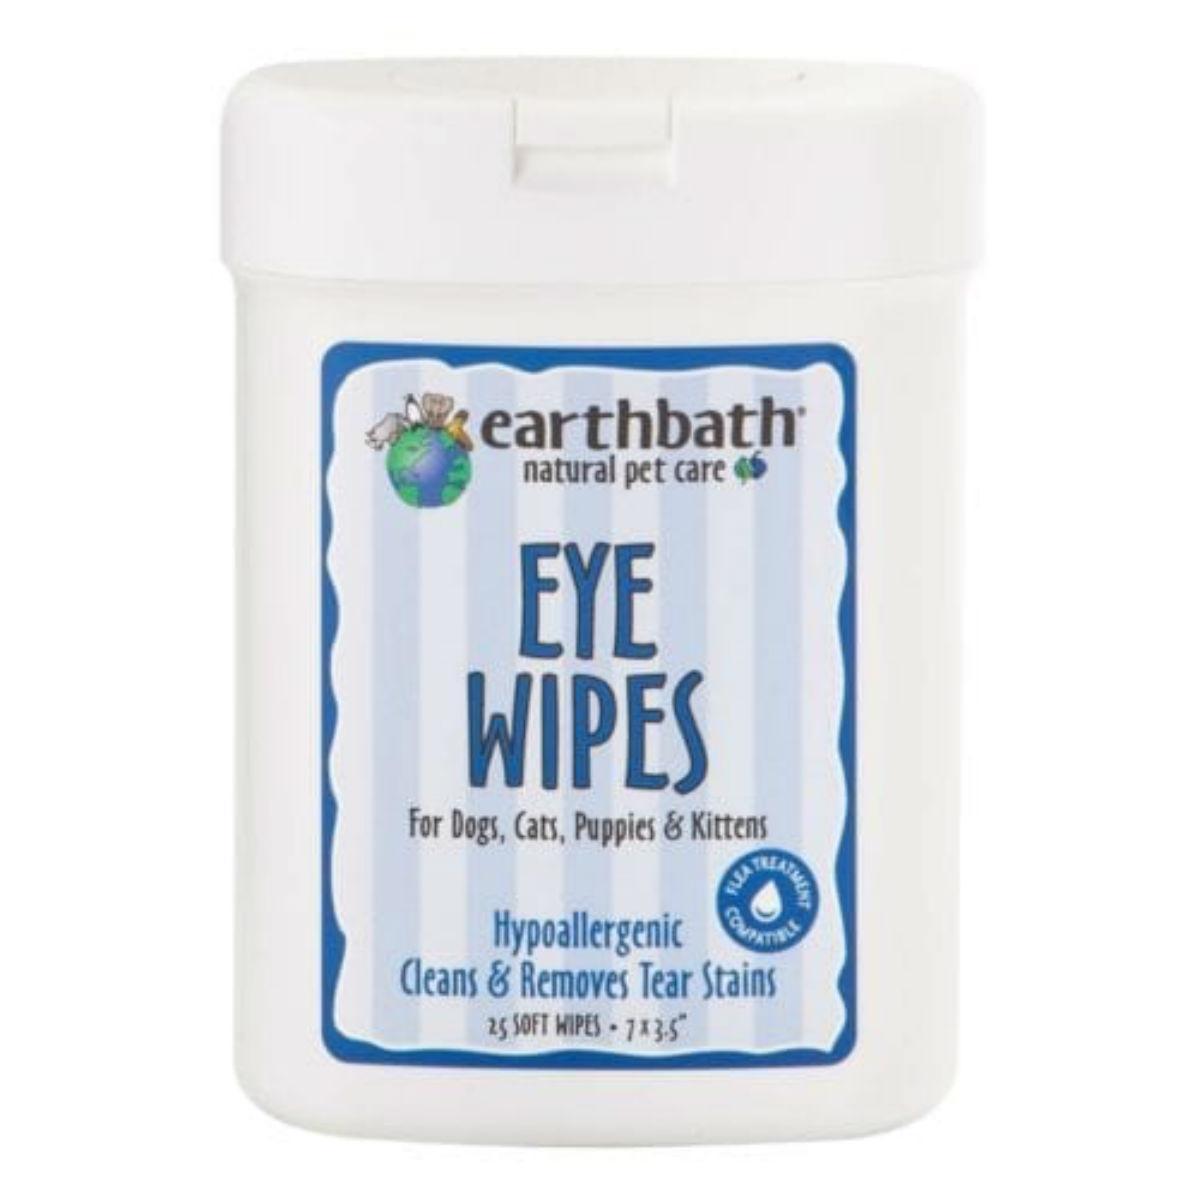 Earthbath Pet Eye Wipes